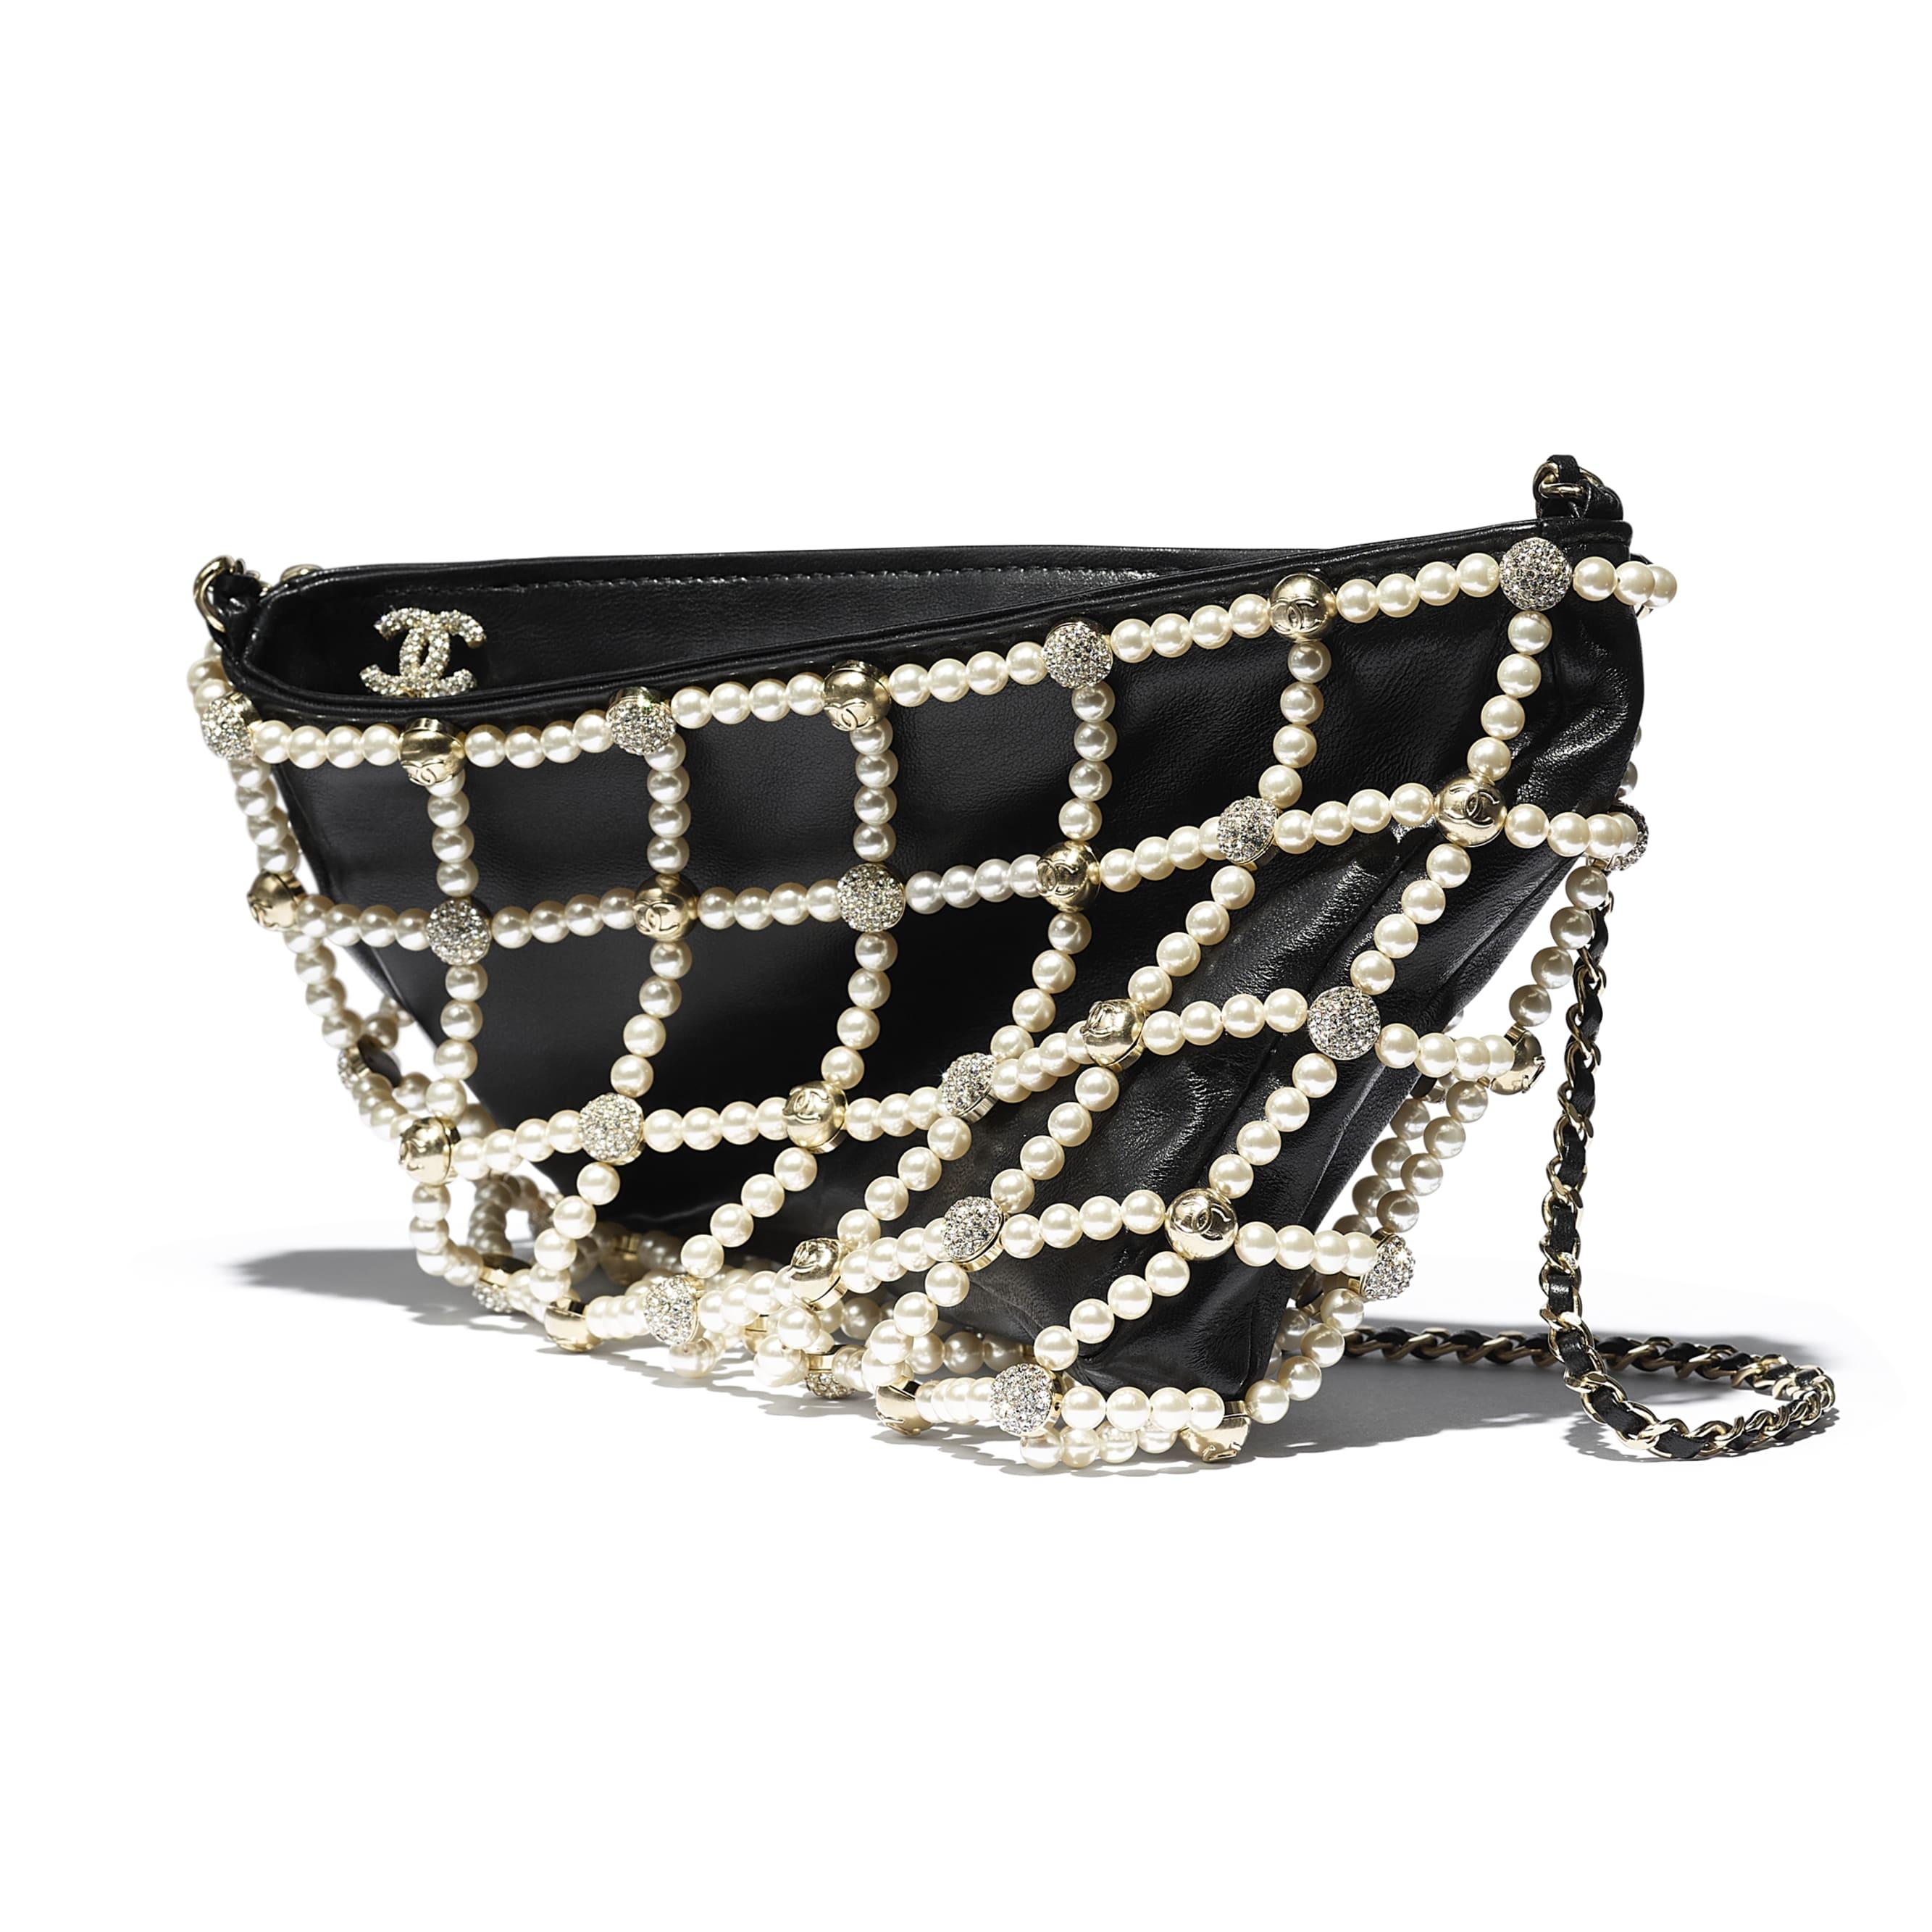 Clutch - Black - Lambskin, Calfskin, Glass Pearls, Strass & Gold-Tone Metal - CHANEL - Vista extra - ver a versão em tamanho standard